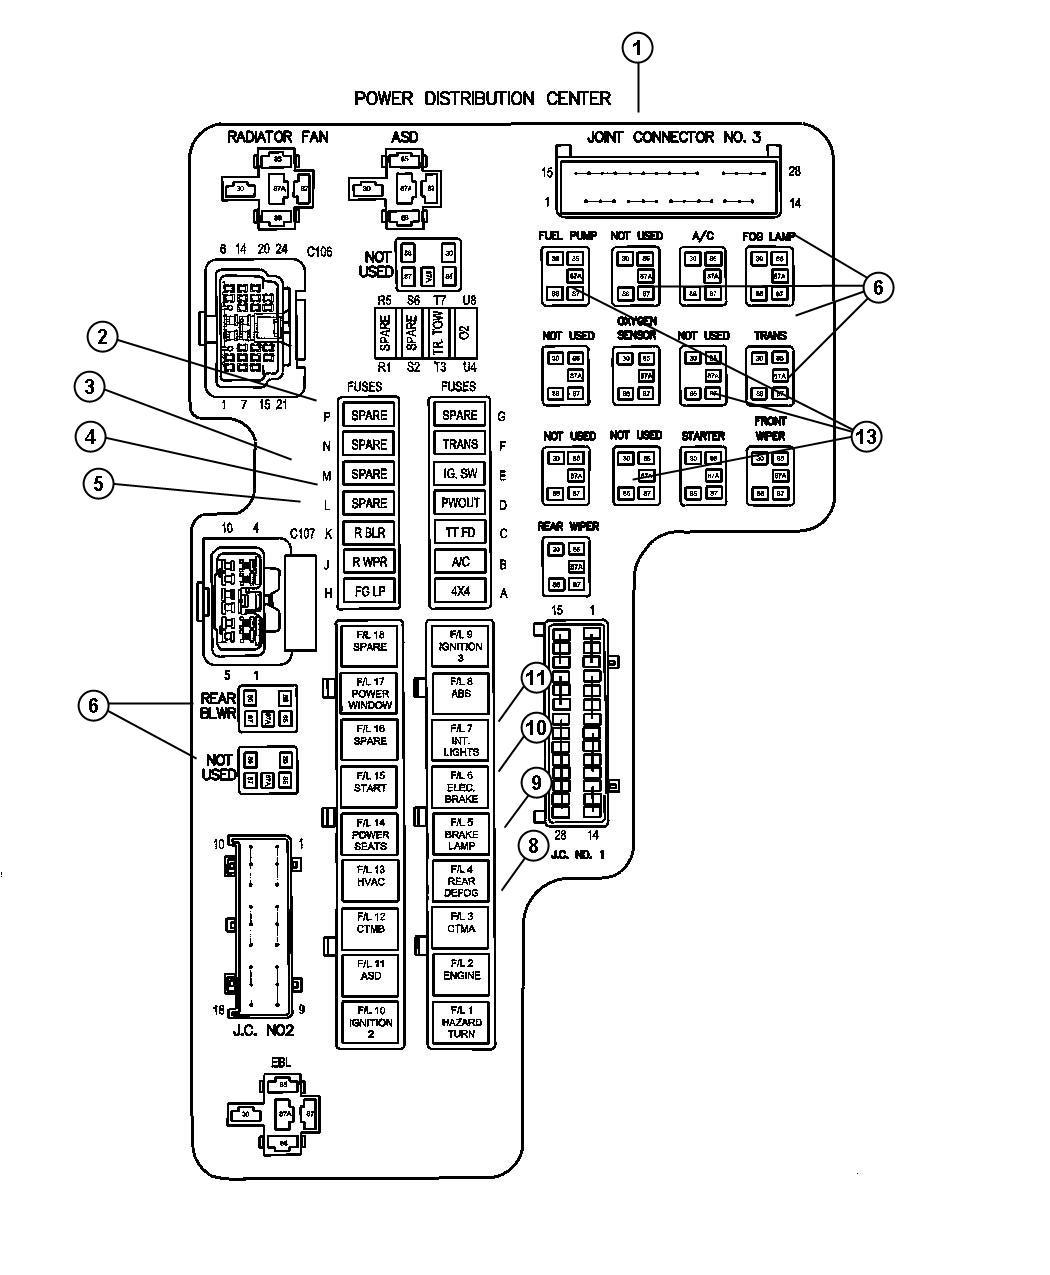 Dodge Dakota Fuse cartridge. 50 amp. Export, us, canada